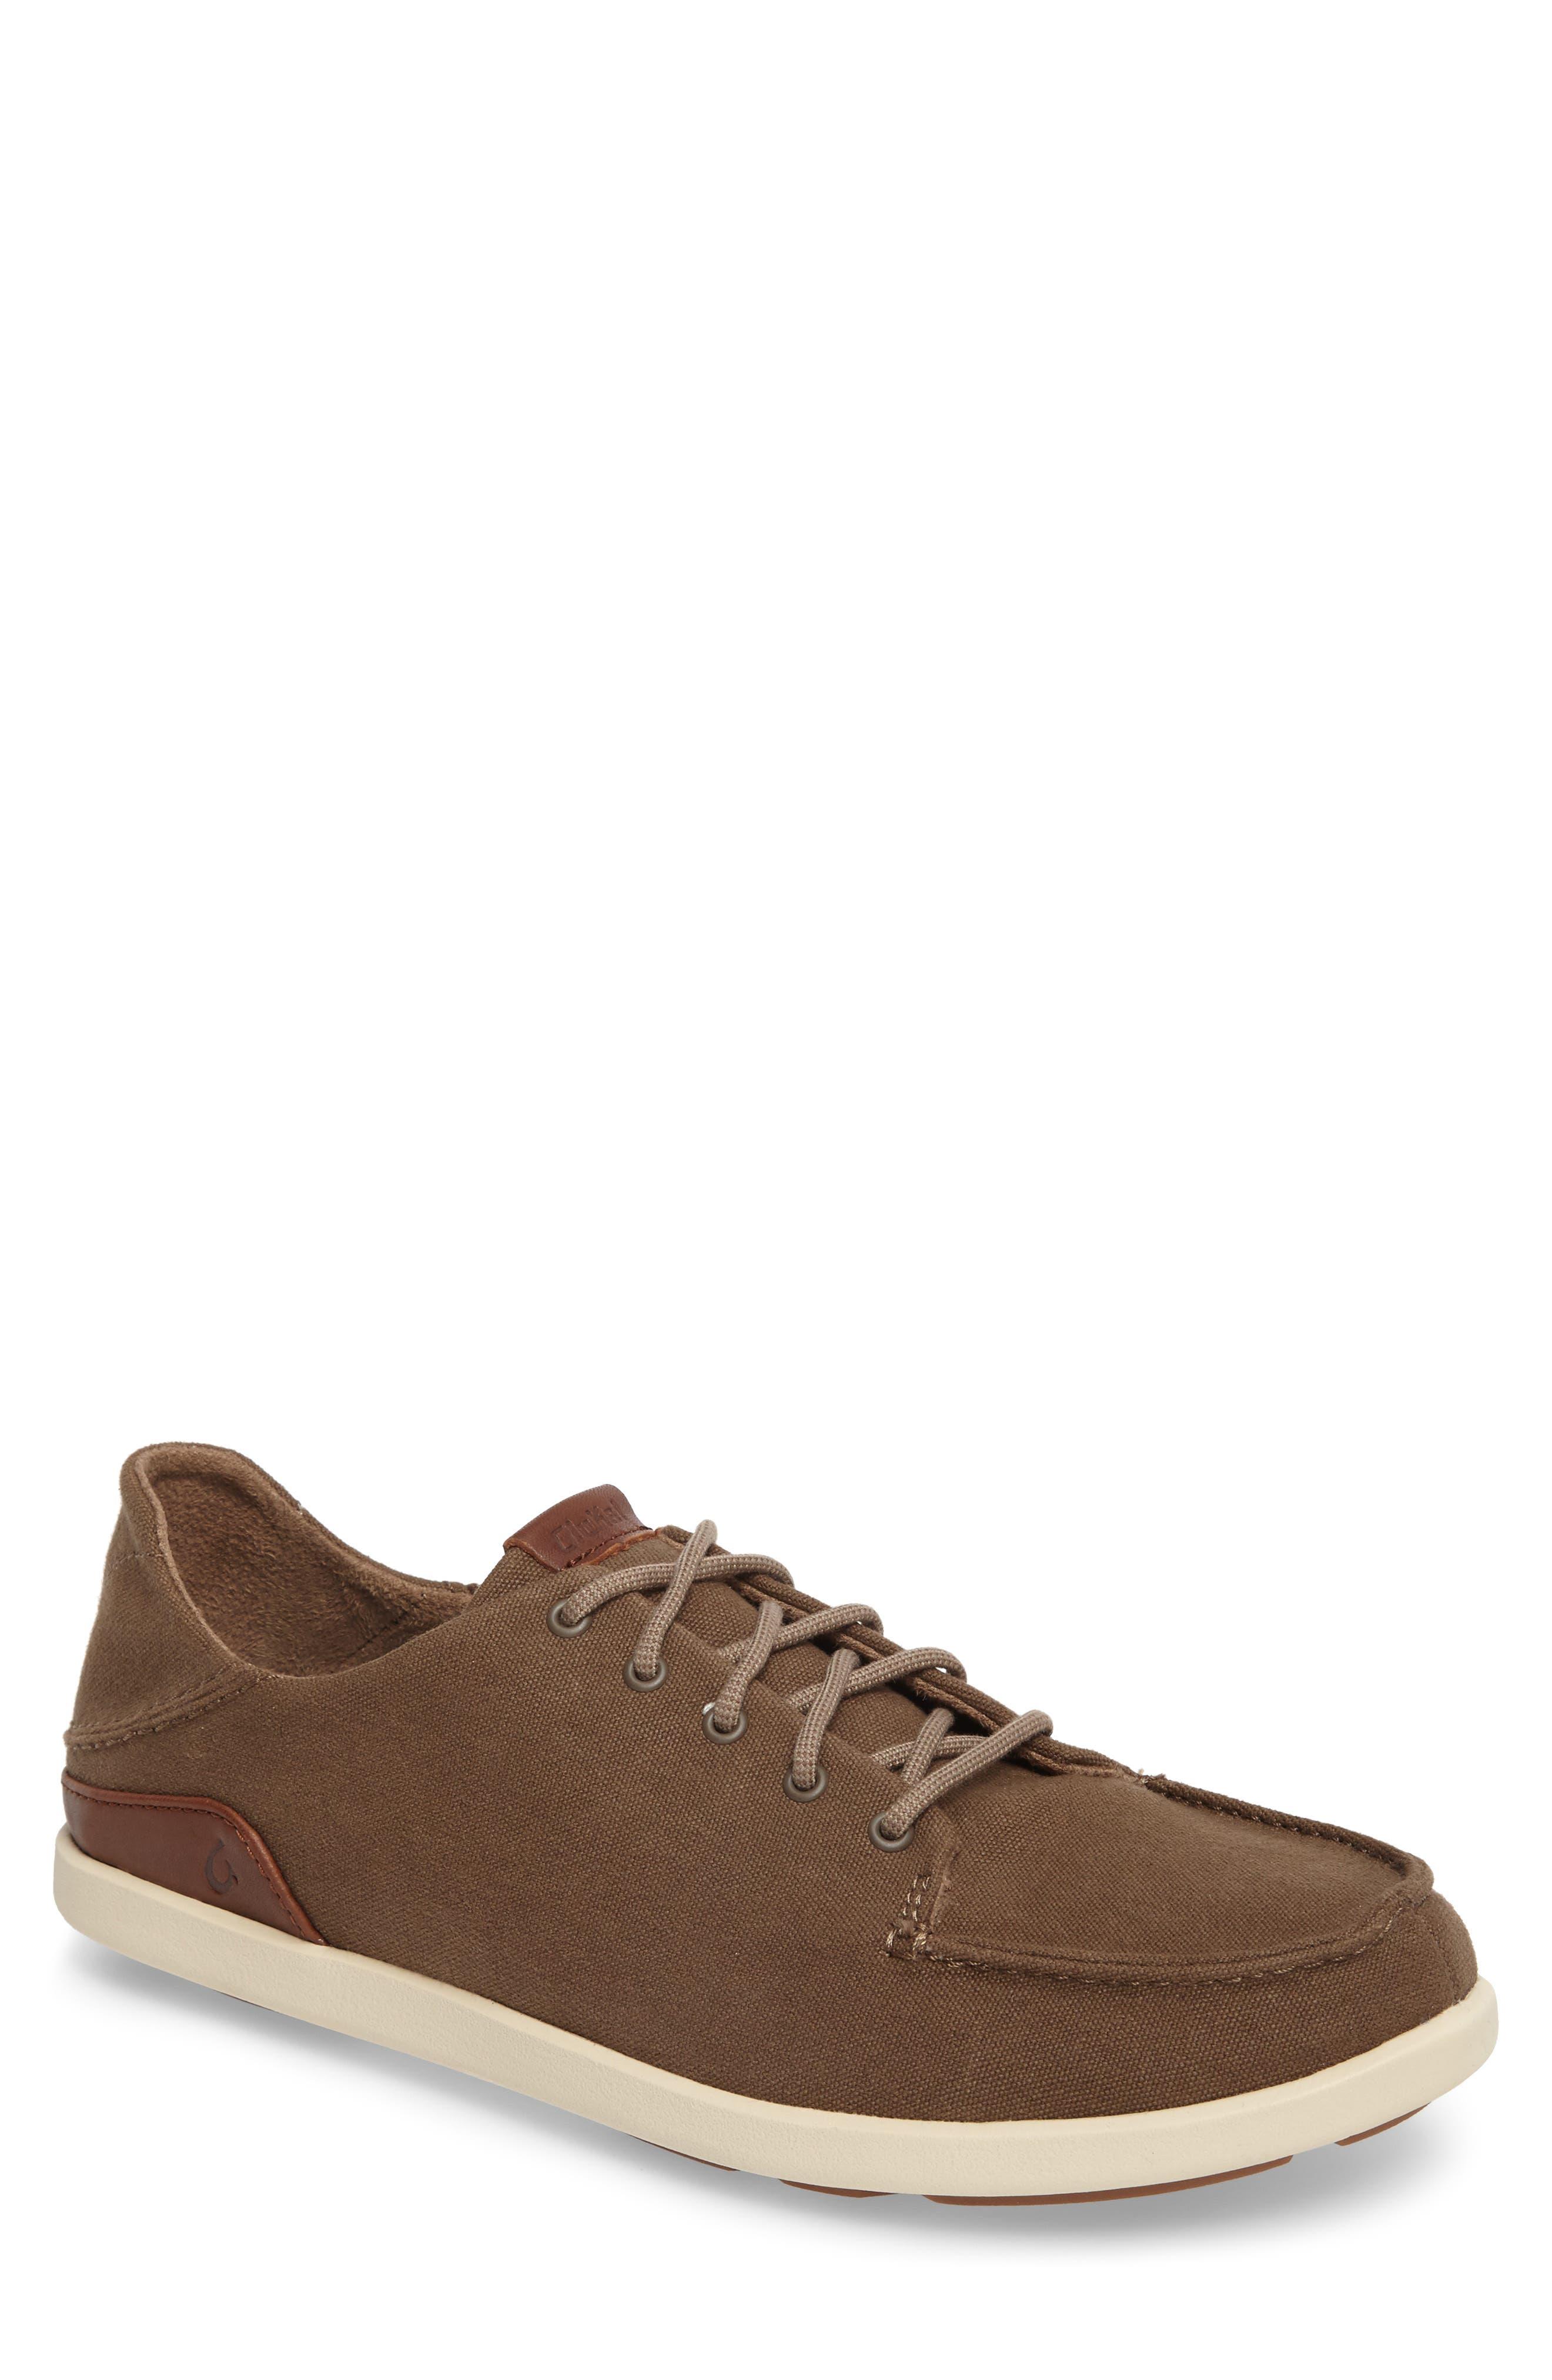 Manoa Sneaker,                             Main thumbnail 1, color,                             MUSTANG/ TOFFEE